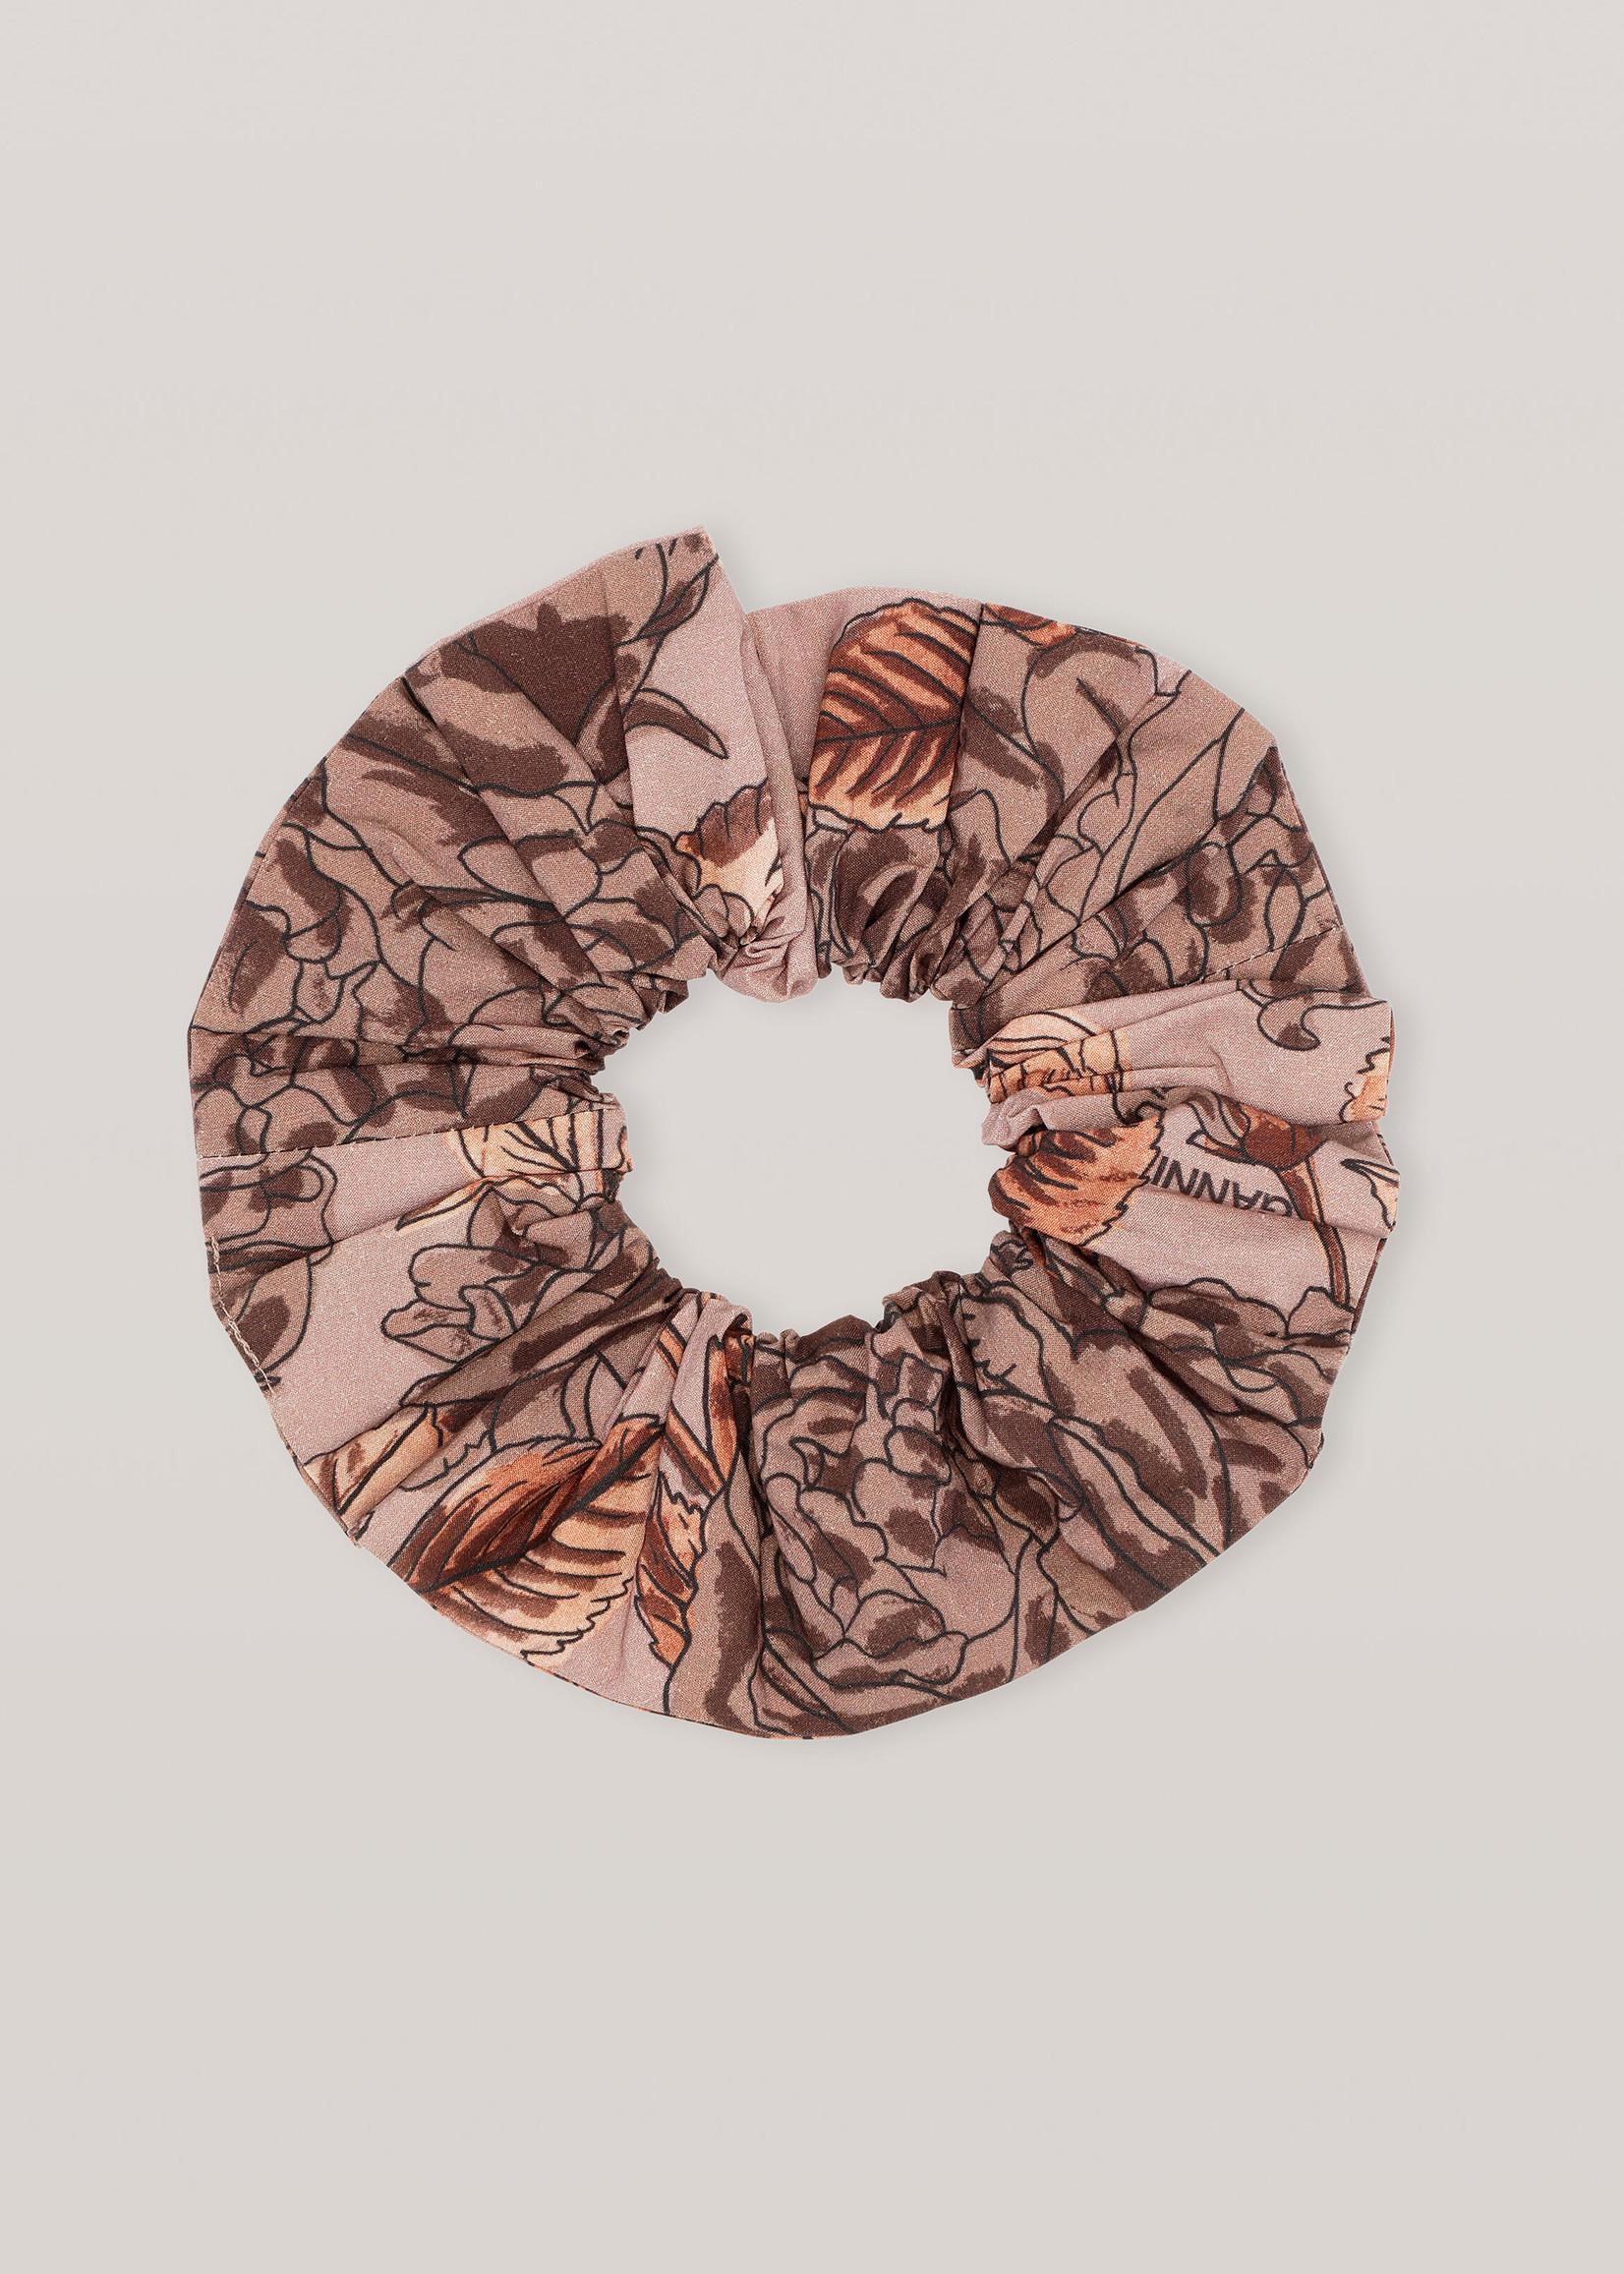 GANNI Floral Scrunchie in Fossil